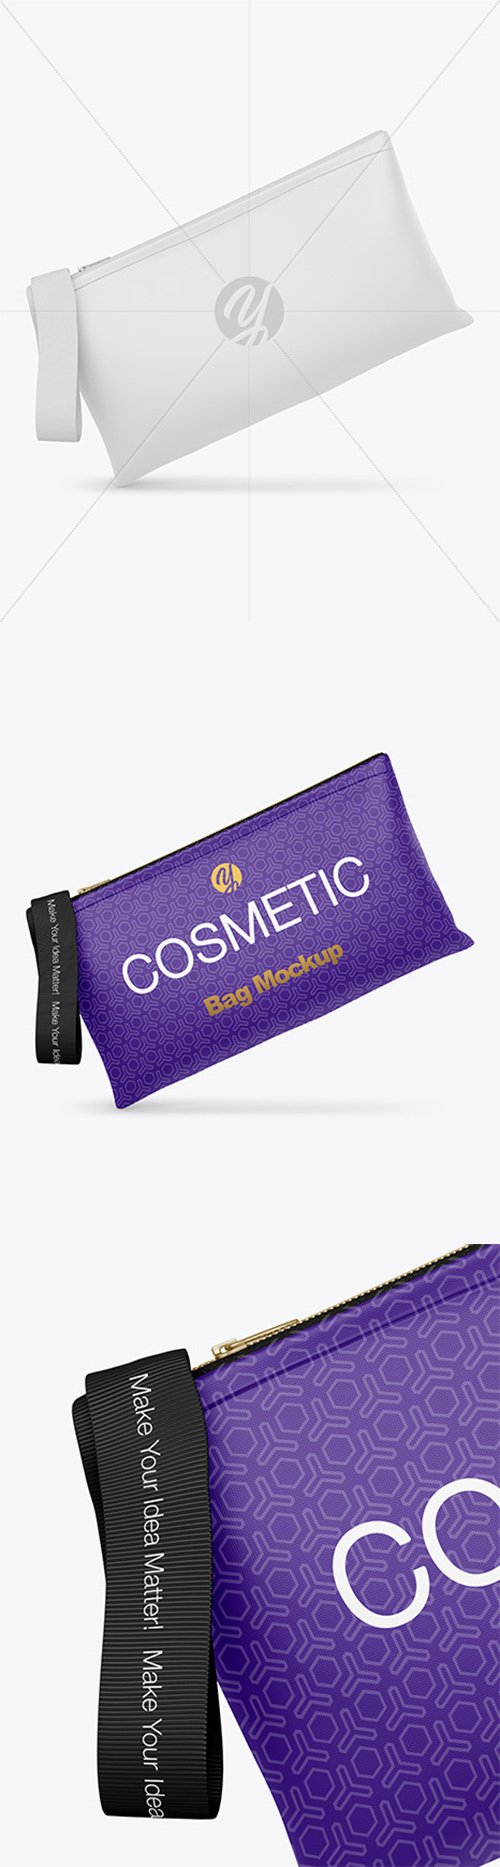 Cosmetic Bag Mockup 65602